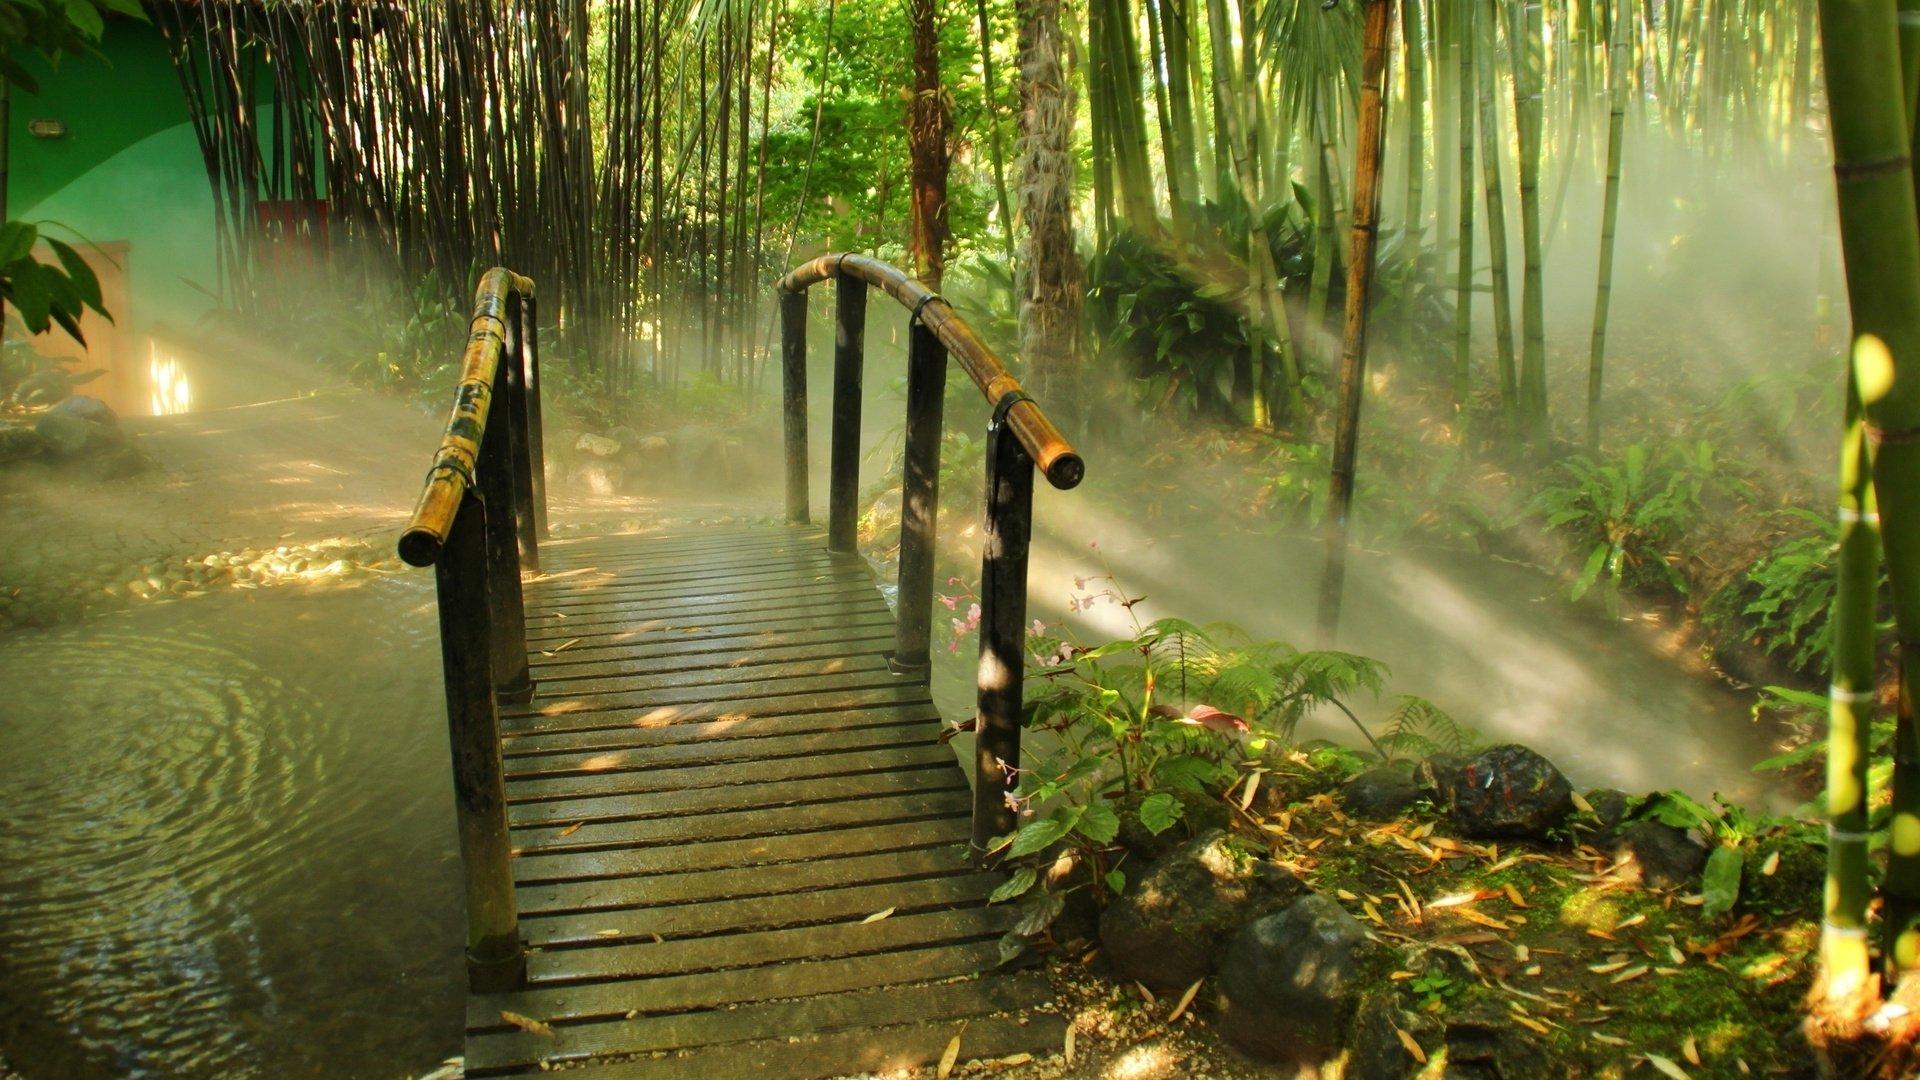 bamboo forest hd wallpaper